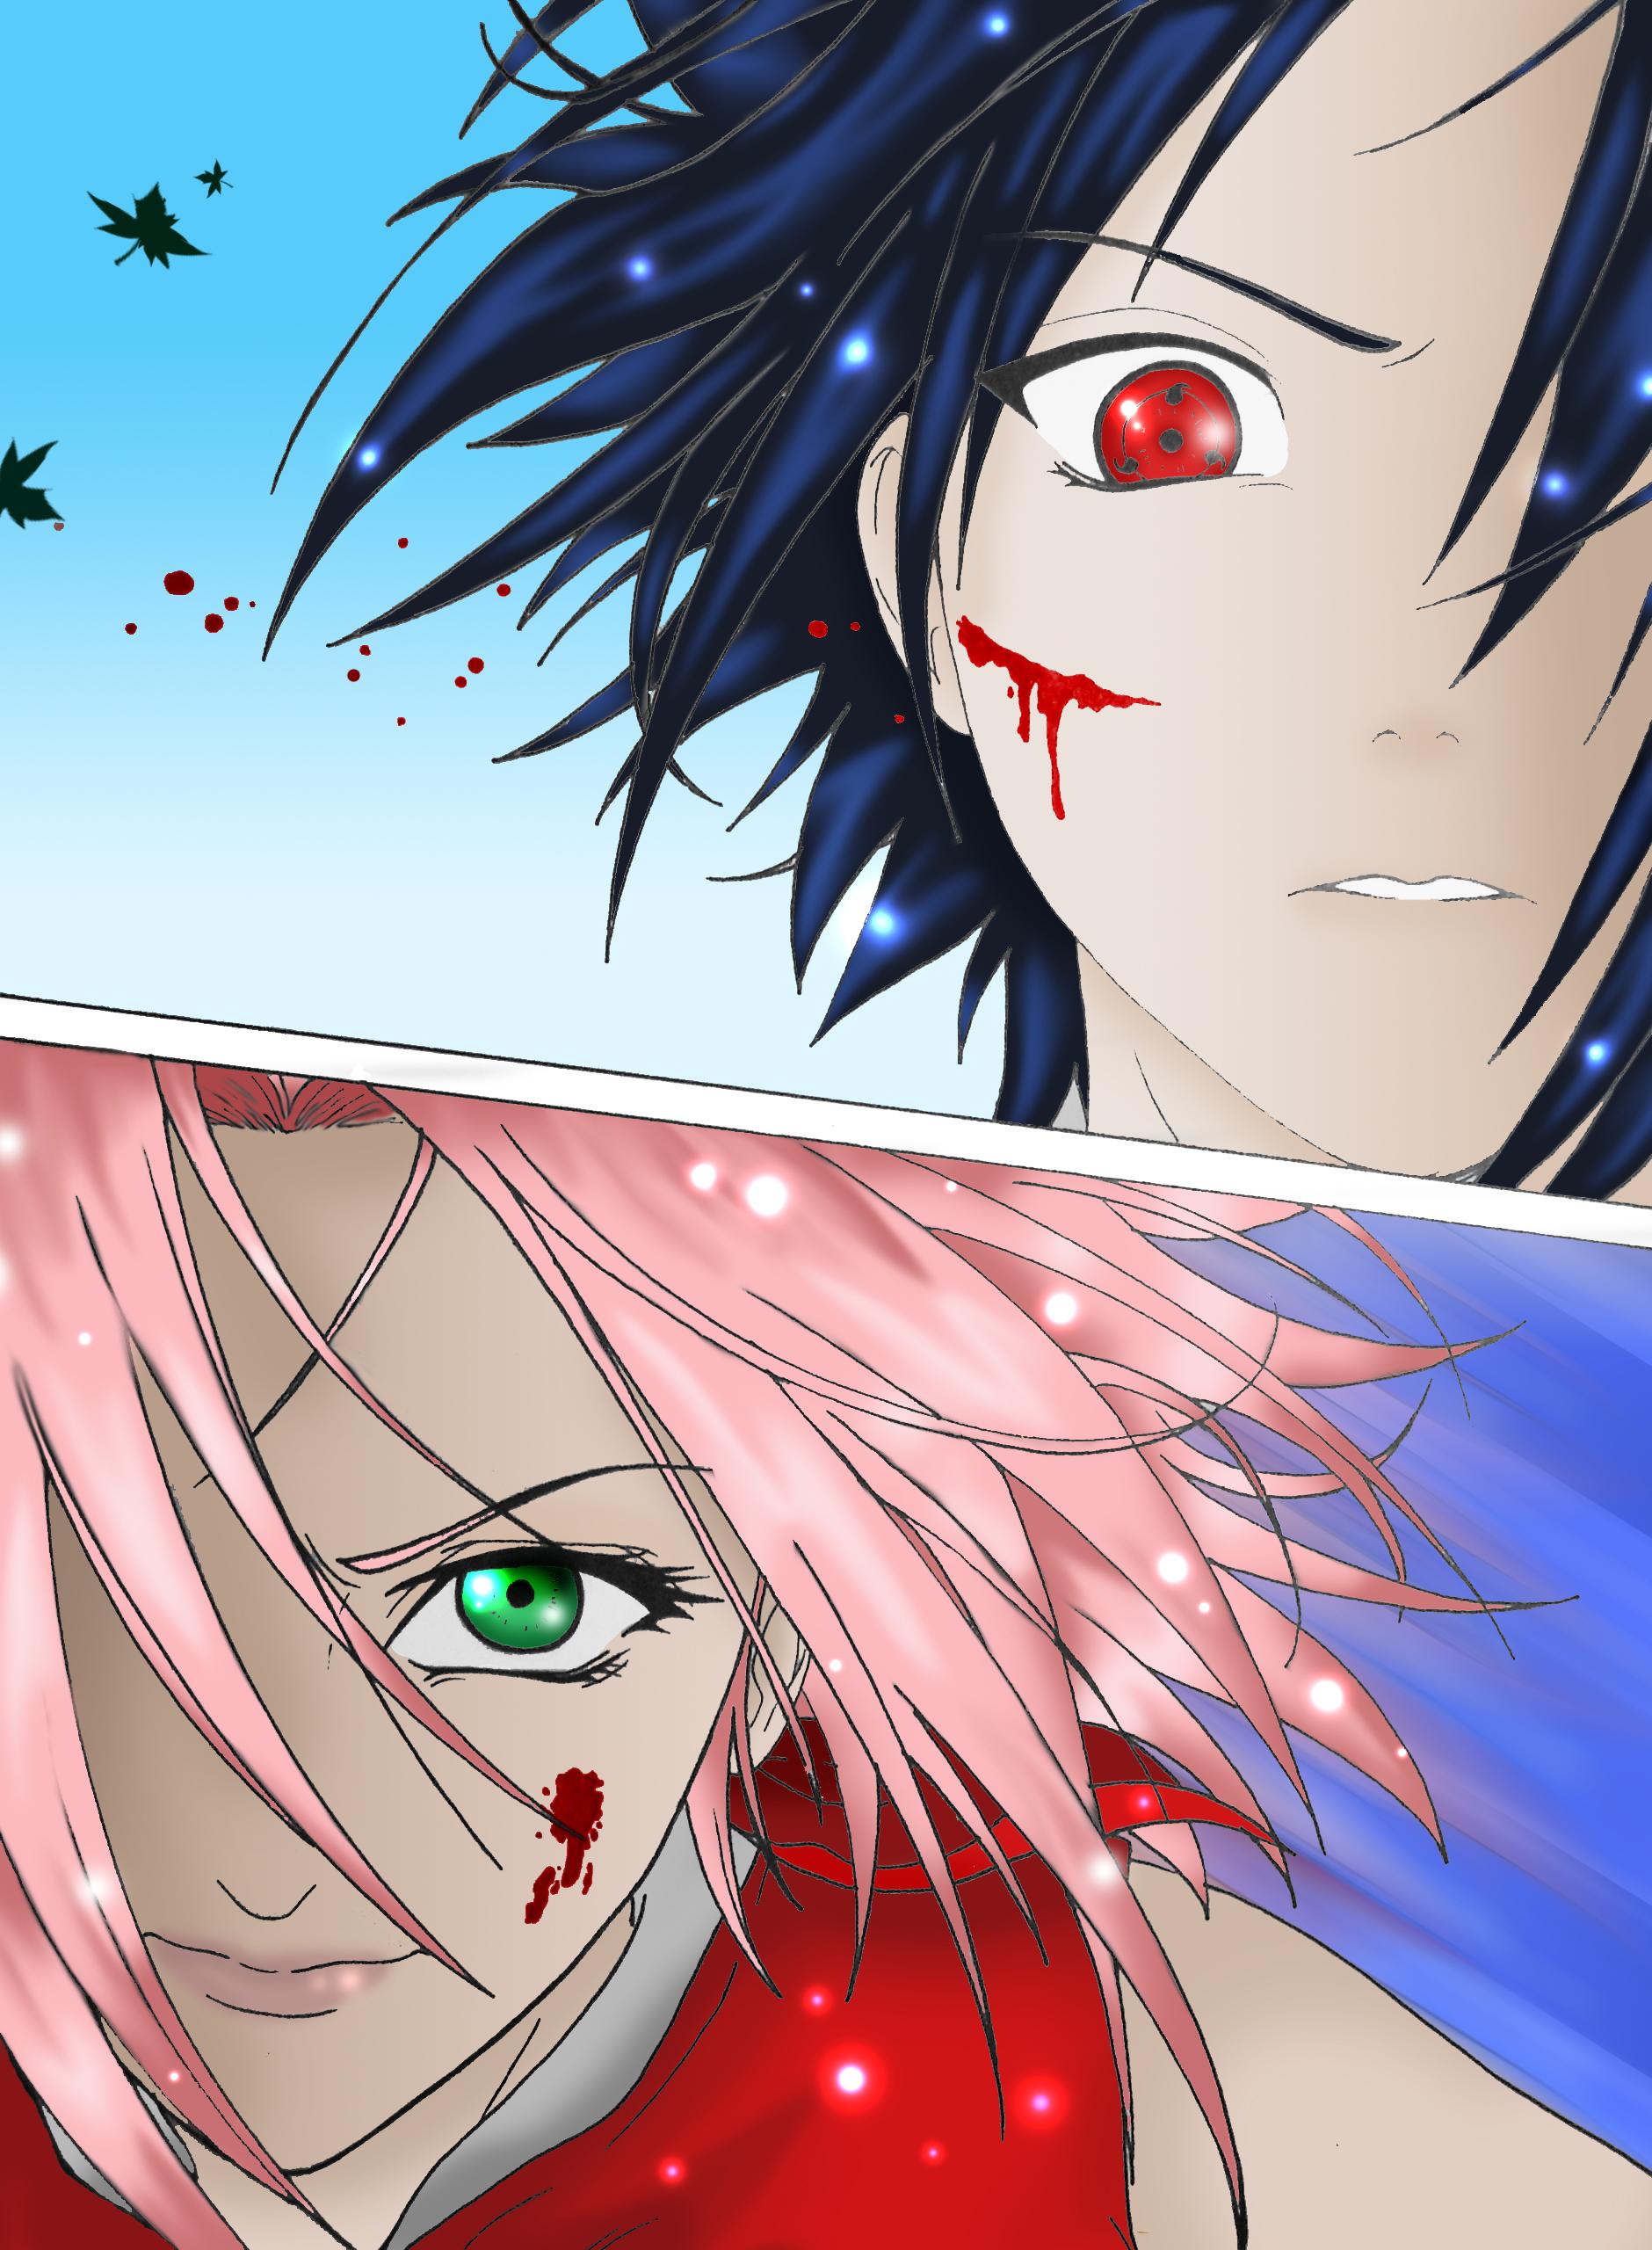 ������ 2011 ���� ������ Sakura_vs_Sasuke_by_MuzzaThePerv.jpg